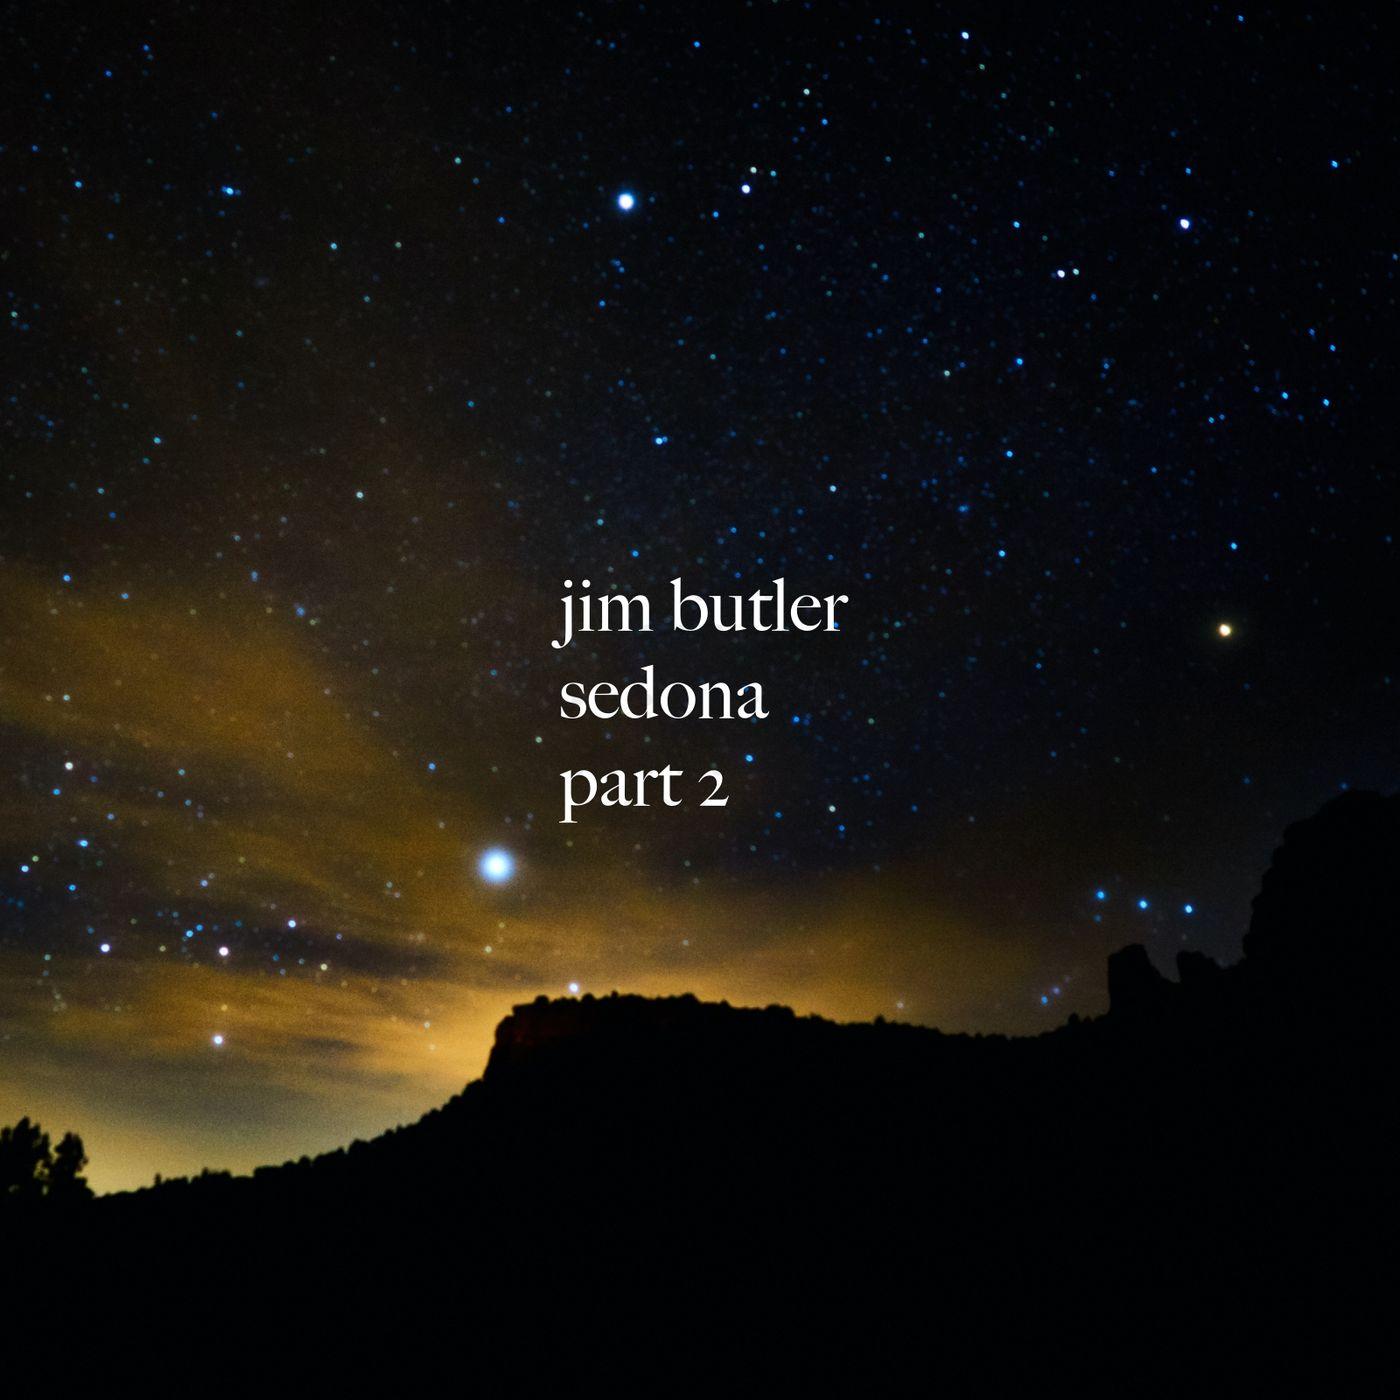 Deep Energy 313 - Sedona - Part 2 - Music for Sleep, Meditation, Relaxation, Massage, Yoga, Reiki, Sound Healing and Therapy